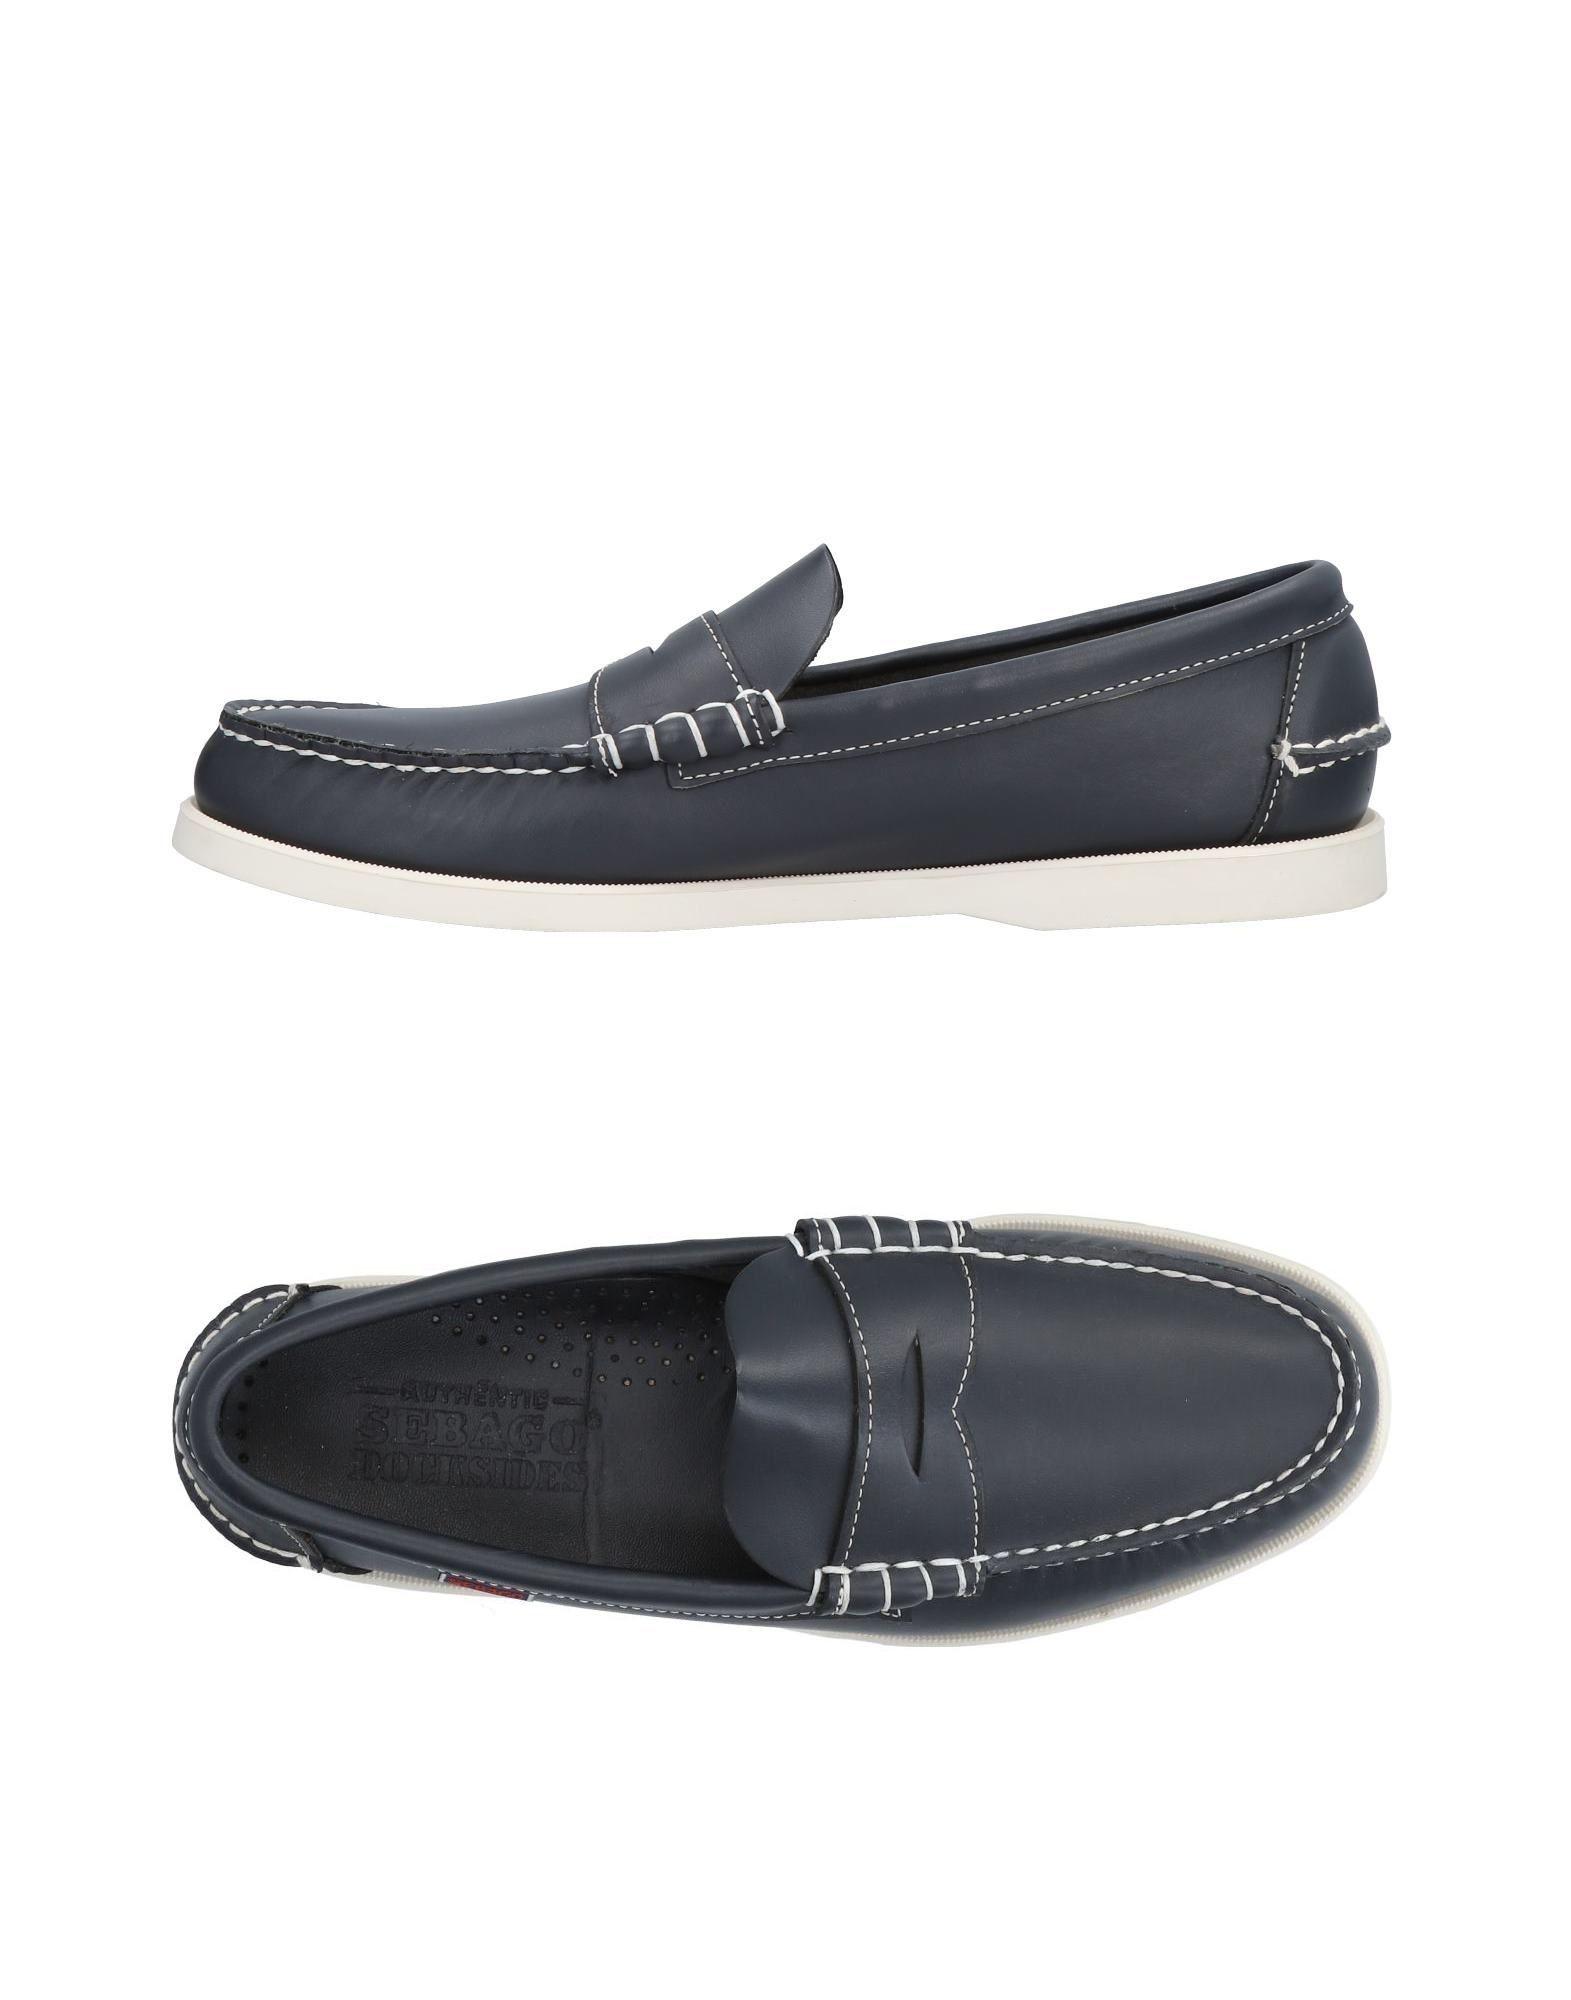 Sebago Docksides Mokassins Herren  11472358DO Gute Qualität beliebte Schuhe